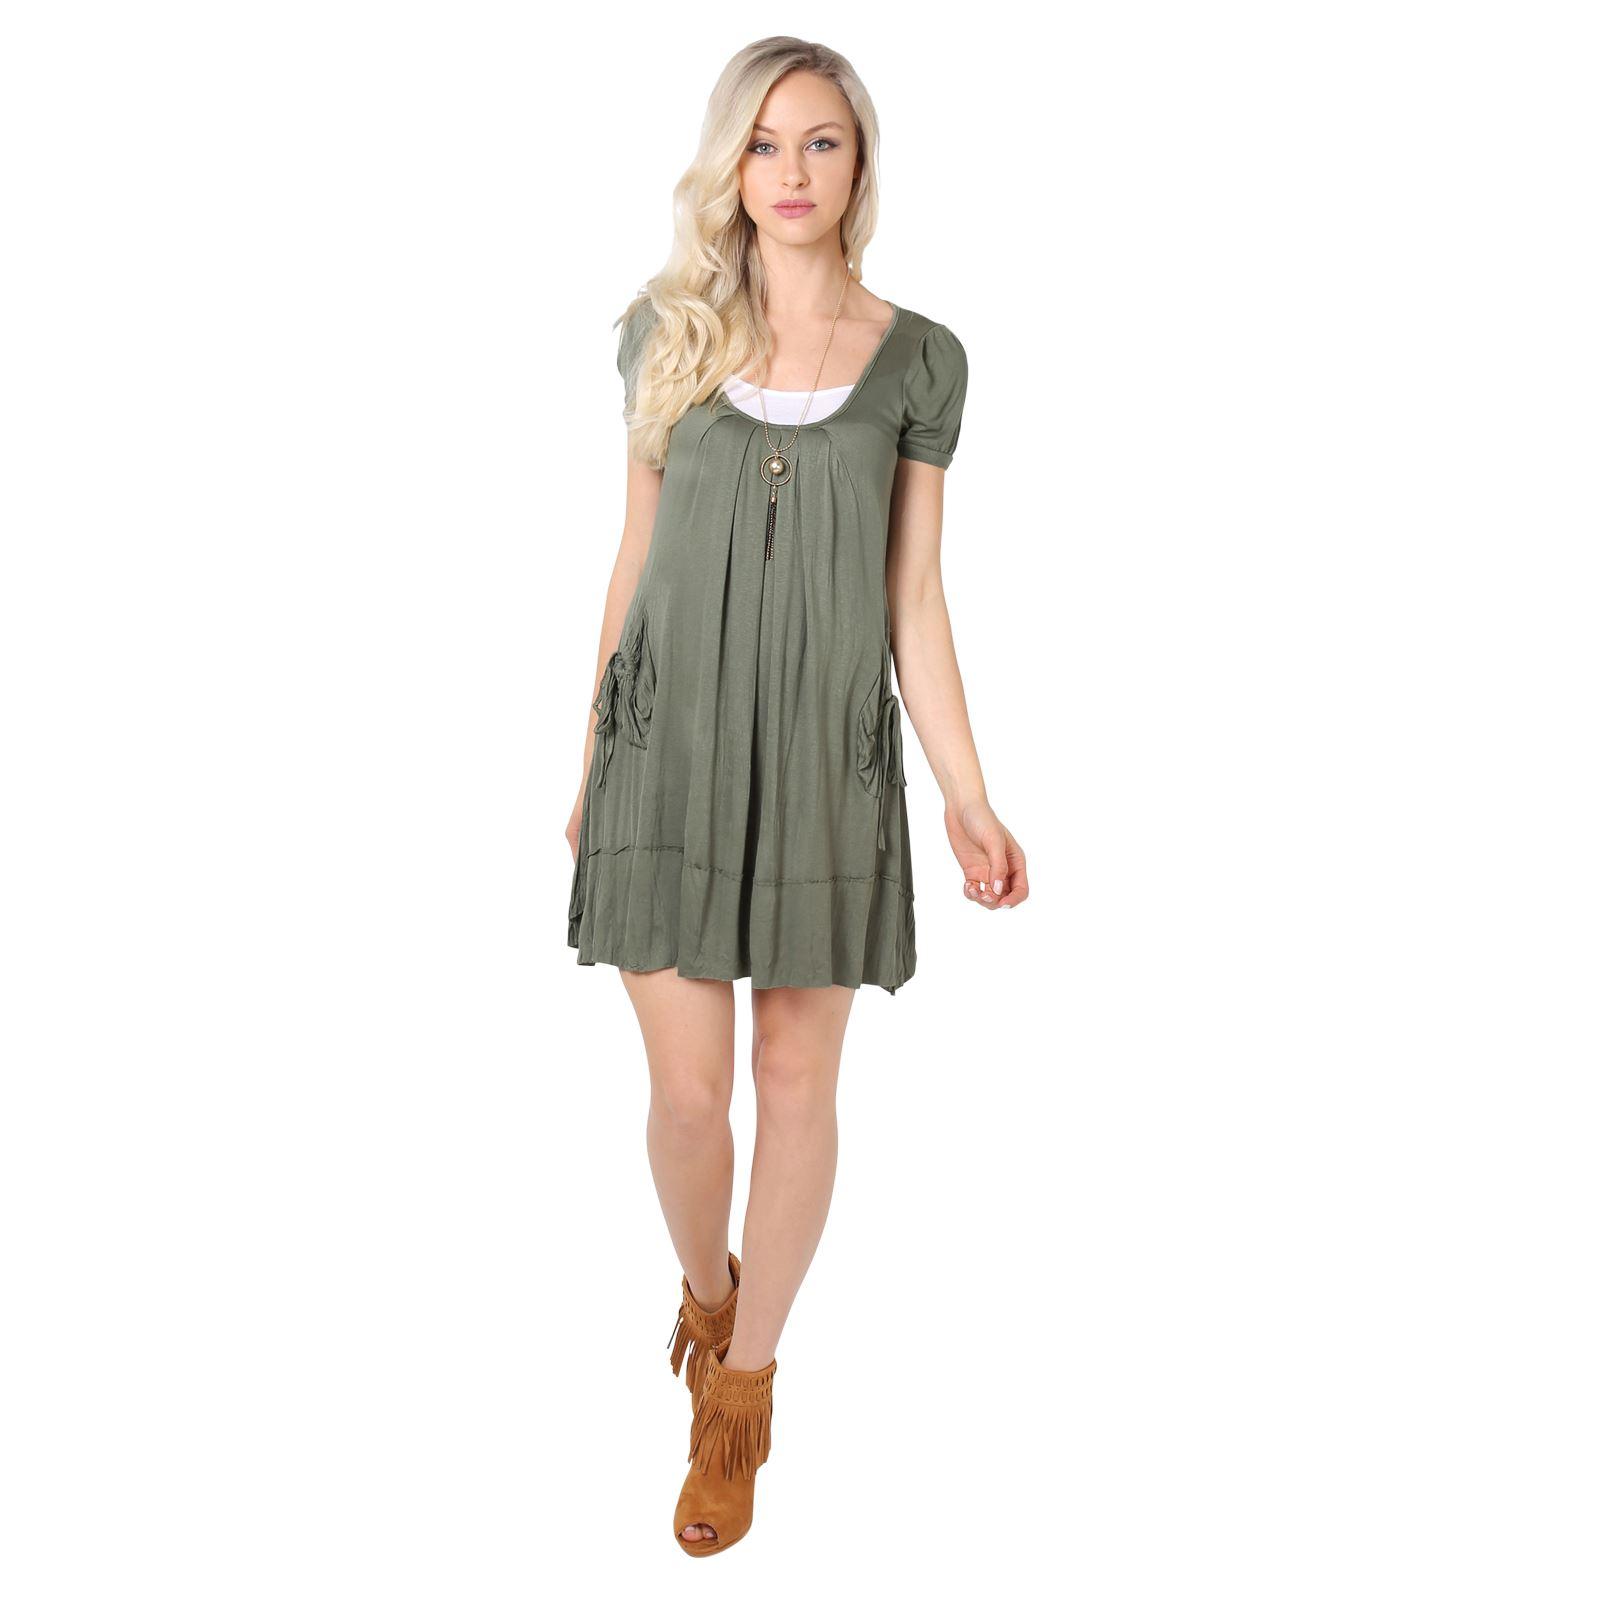 KRISP-Women-2-in-1-Boho-Gypsy-Tunic-Dress-Top-Tee-Jersey-Pleated-A-Line-Necklace thumbnail 12